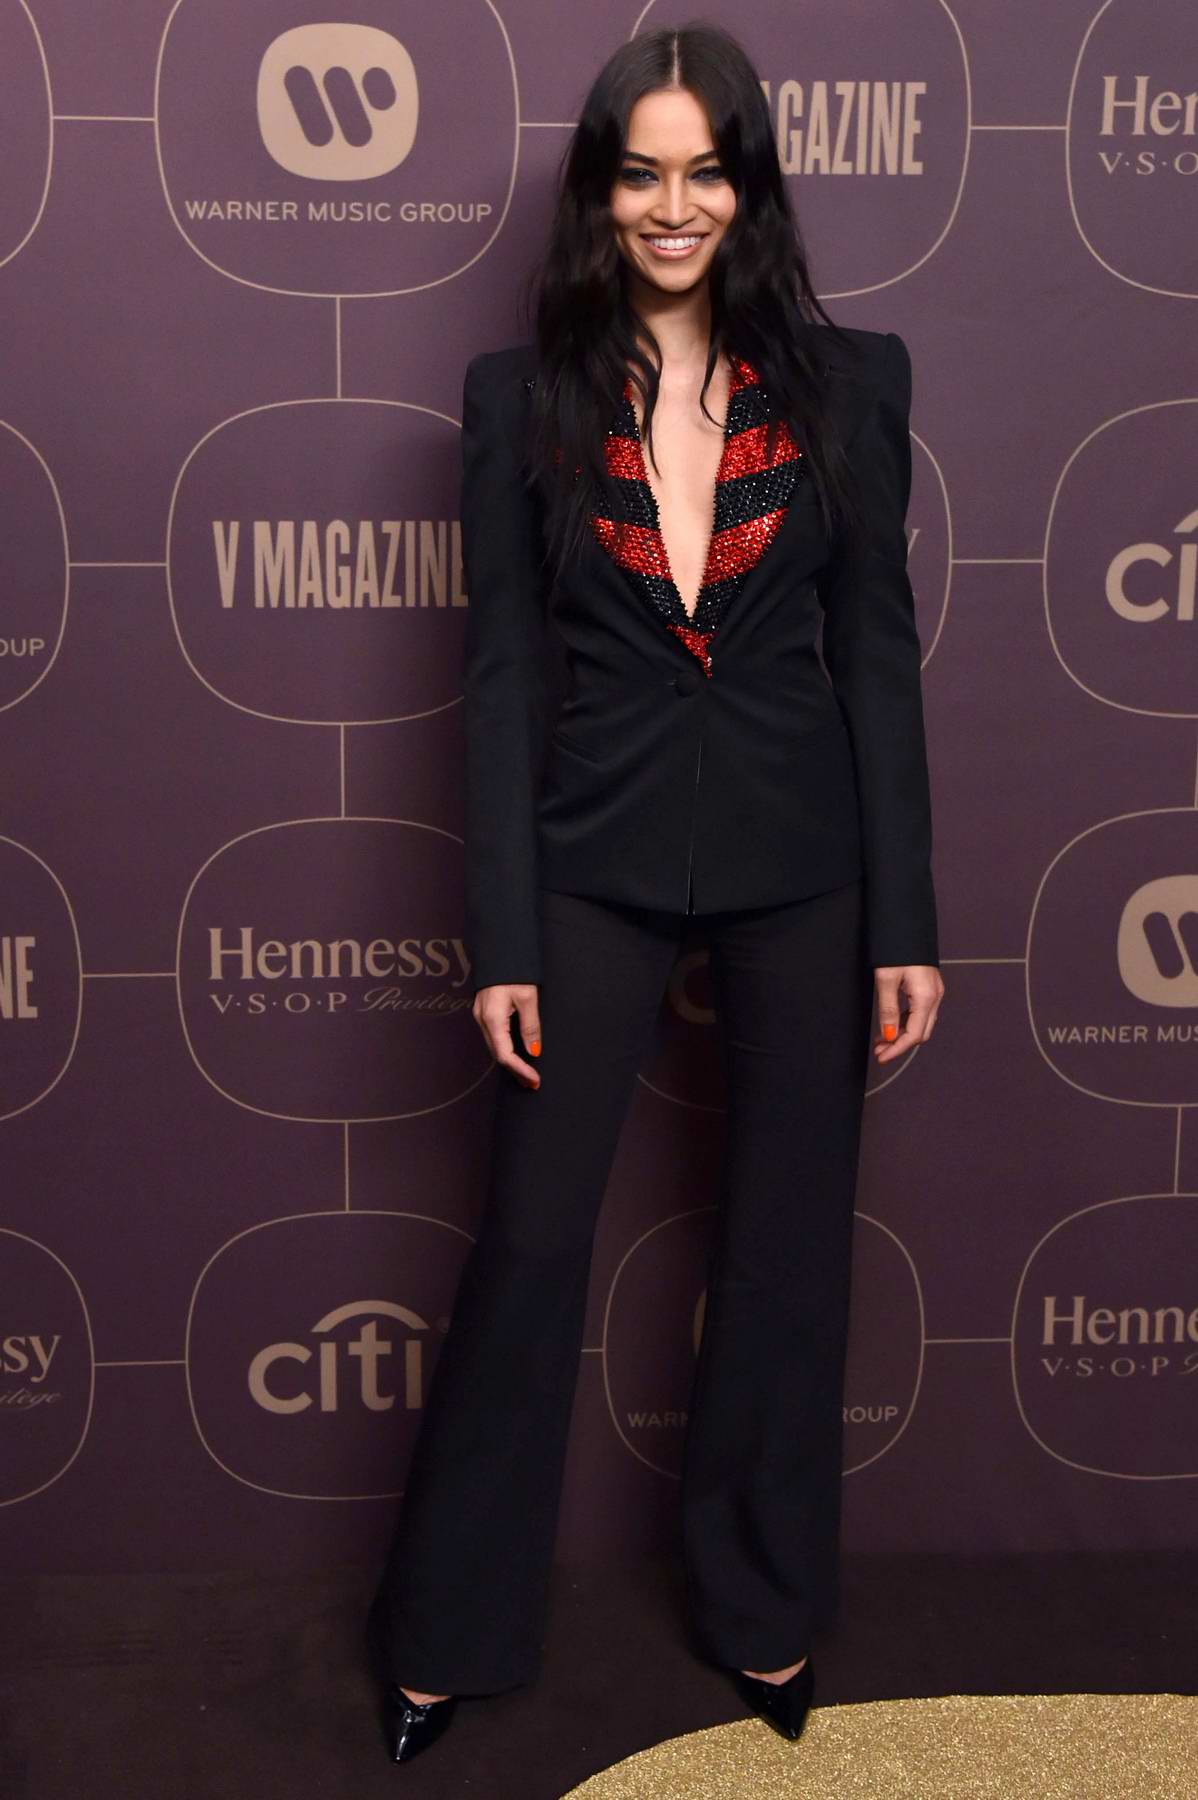 Shanina Shaik at Warner Music Pre-Grammy Party in New York City